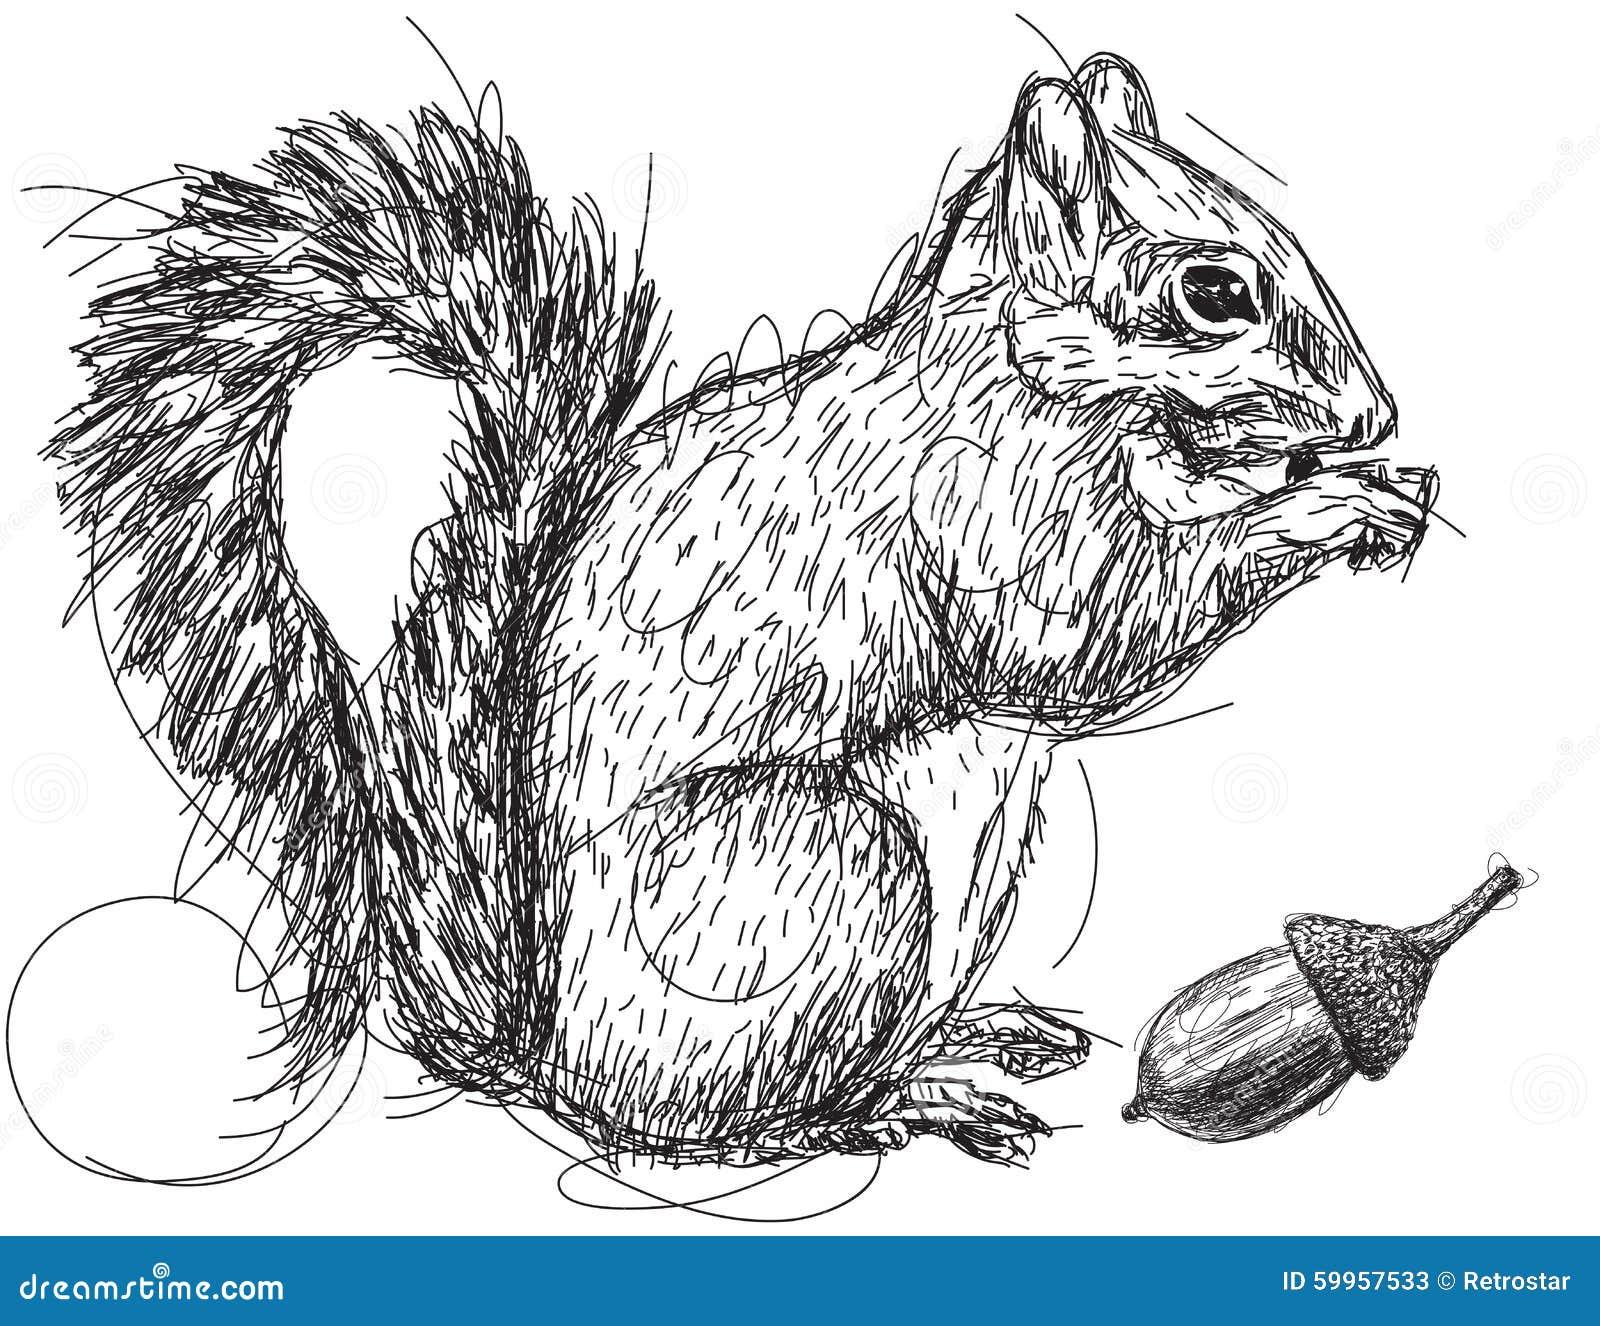 Squirrel nut sketch stock vector. Illustration of eating ...